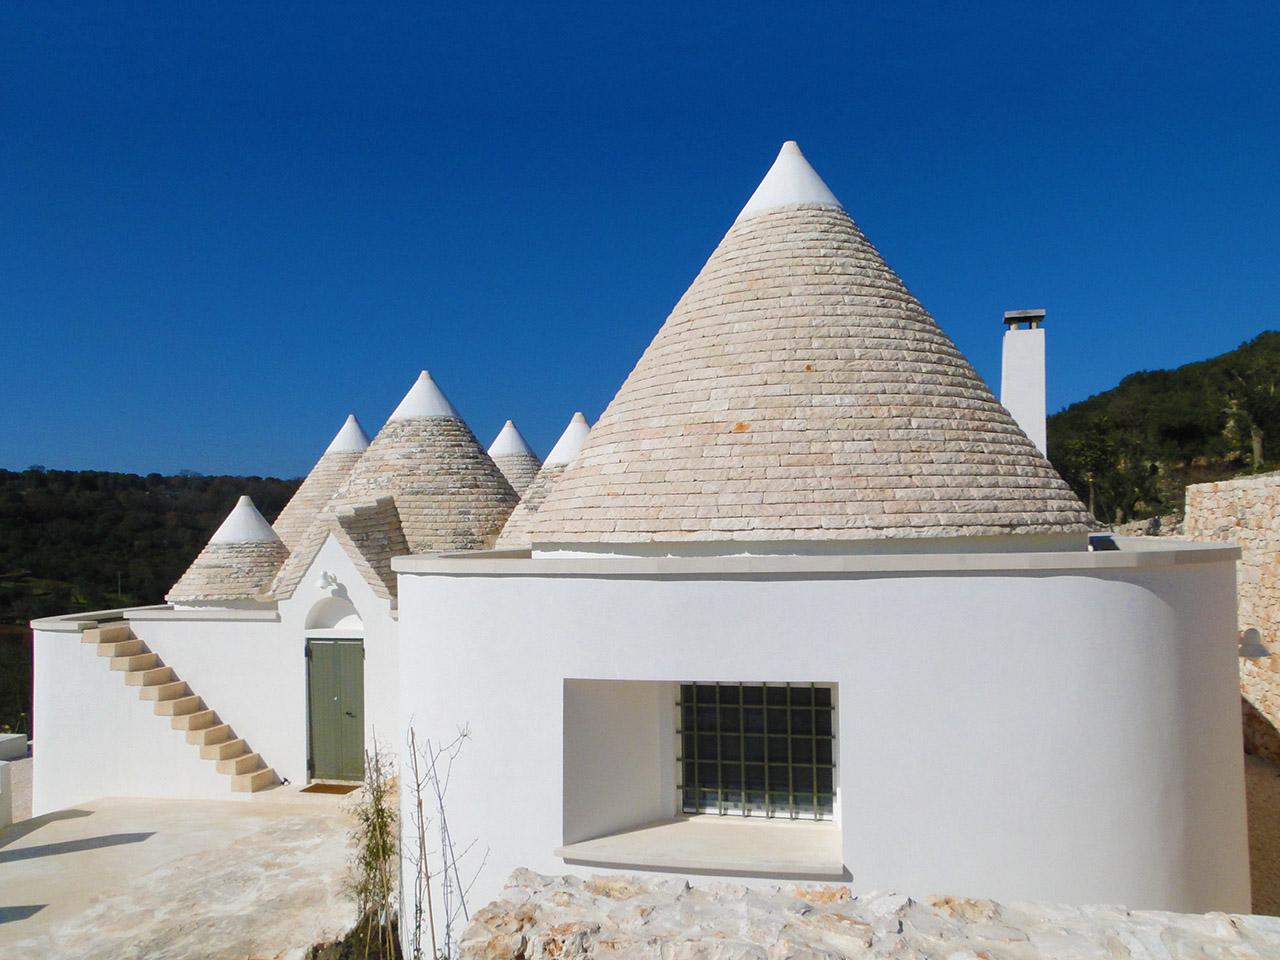 costruzioni restauri sirio ostuni residenza privata montesasso ostuni dsc00060